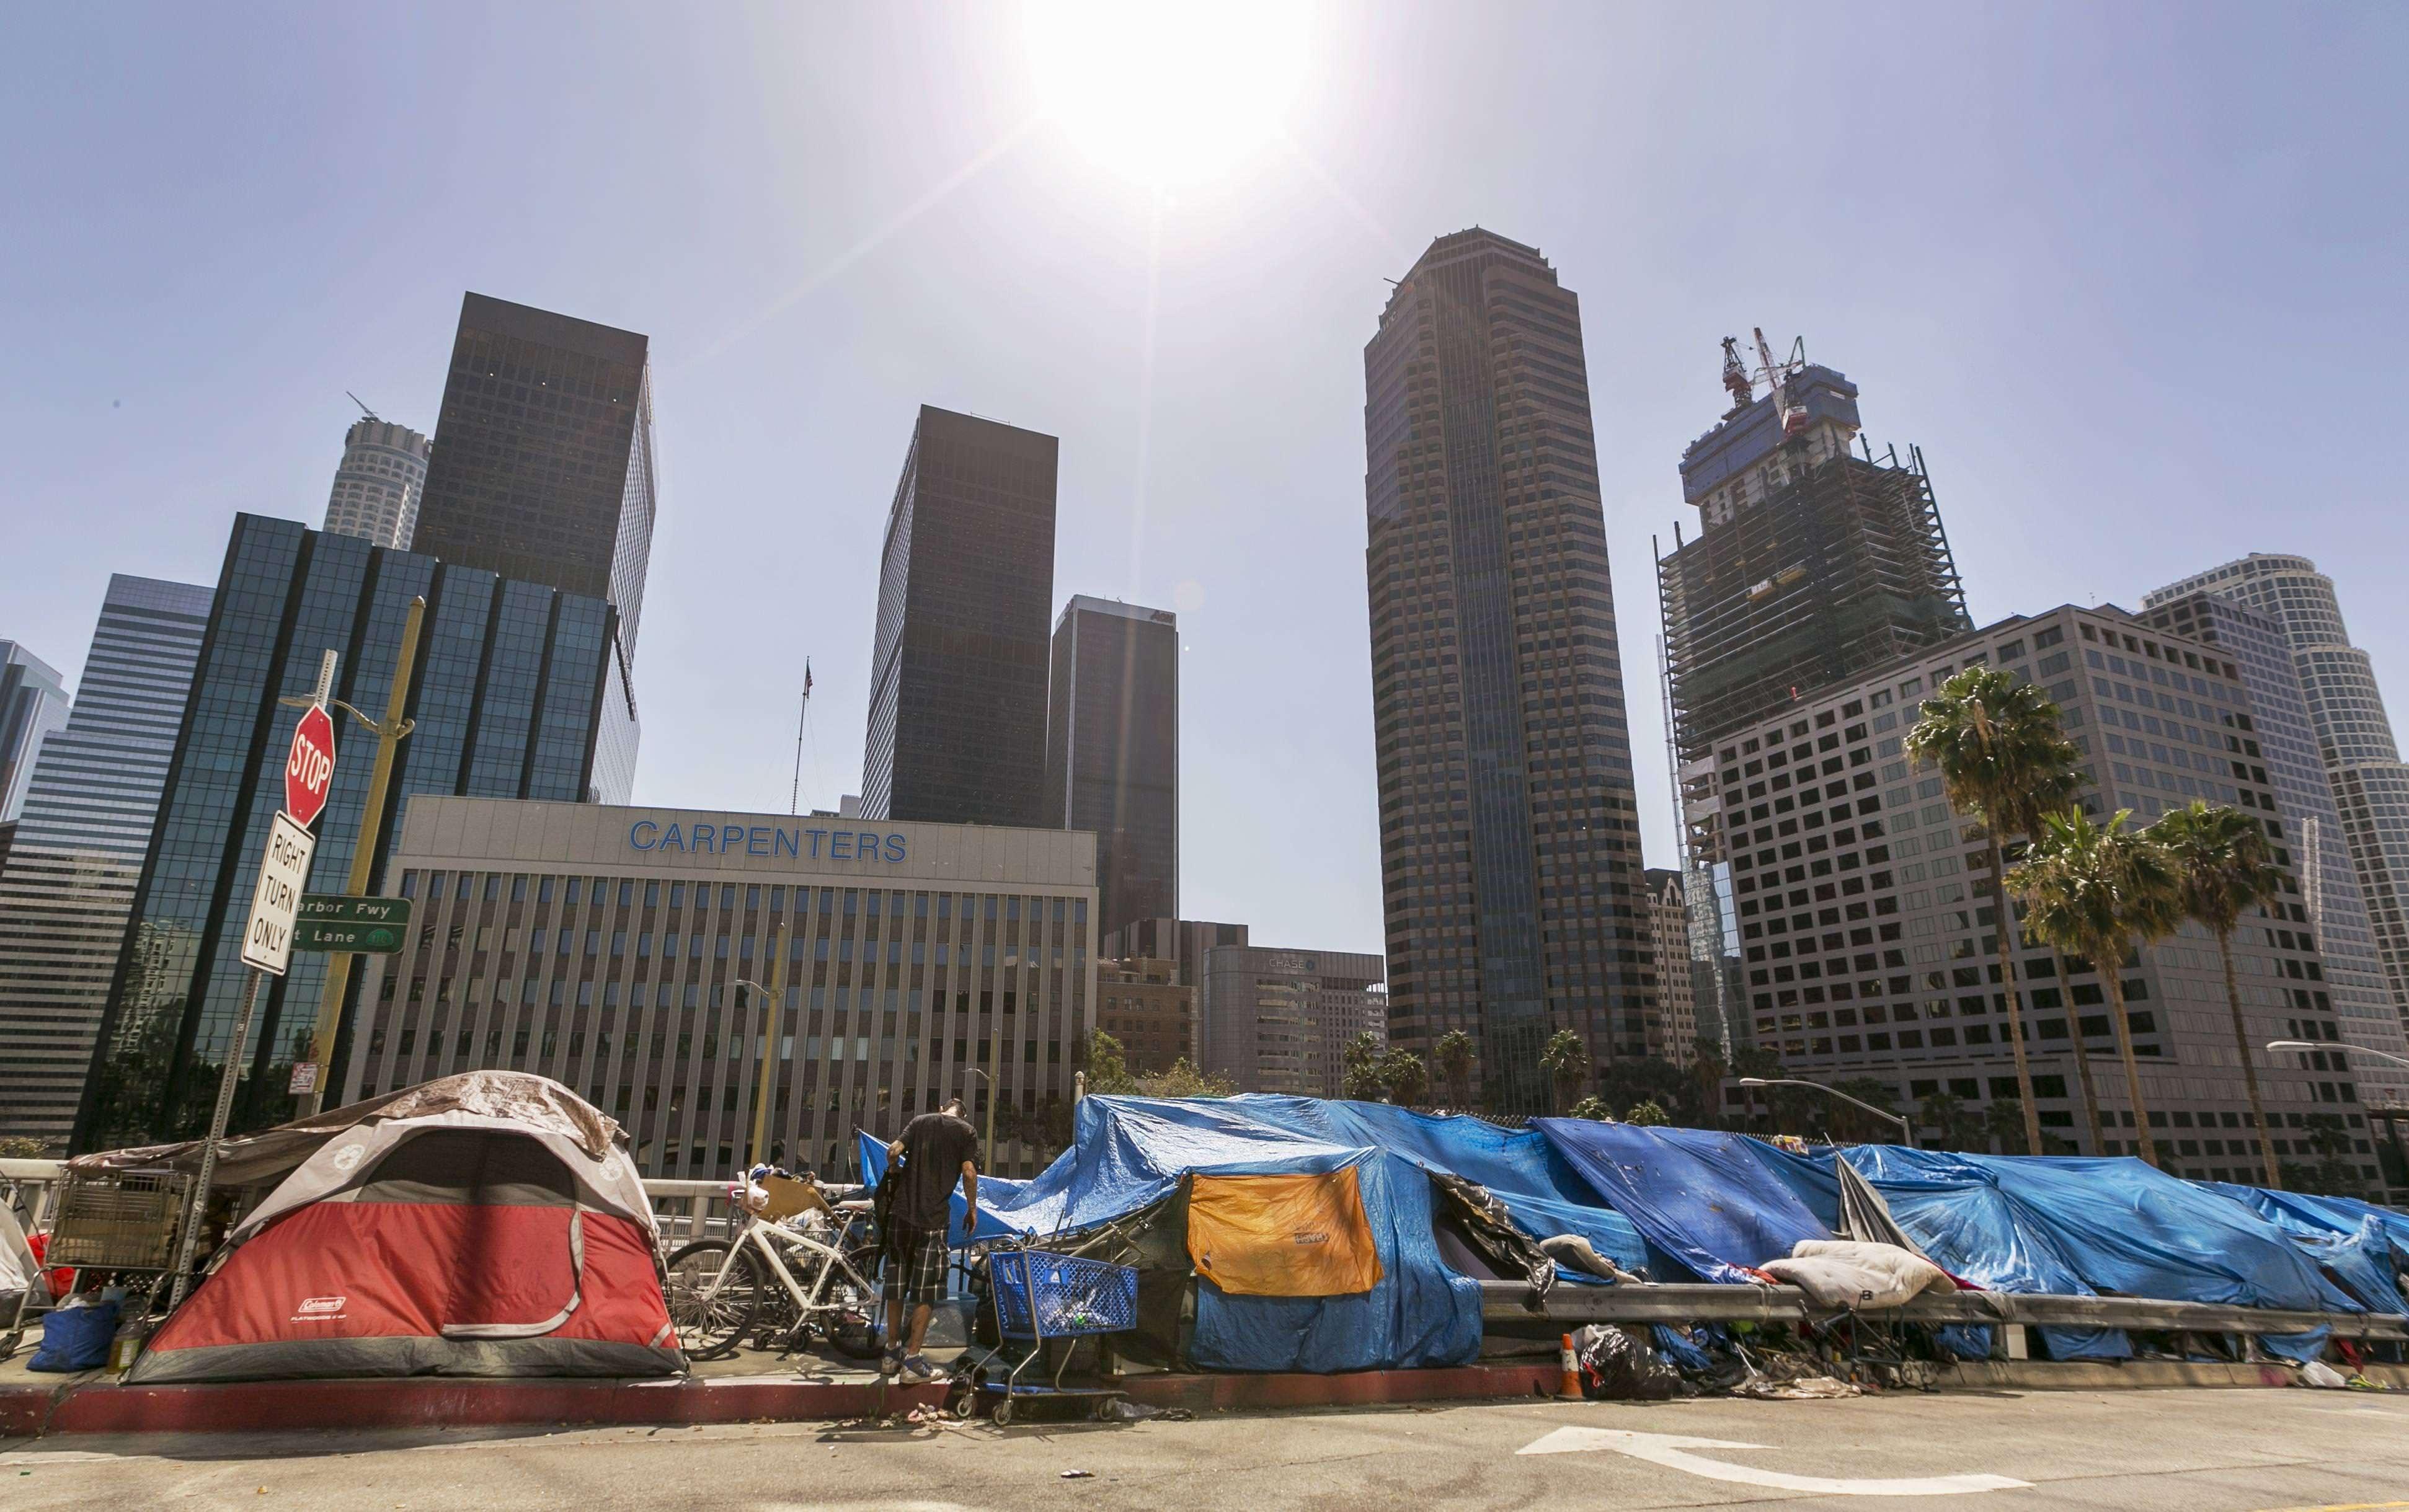 Heckuva job, L.A. ||| Washington Times